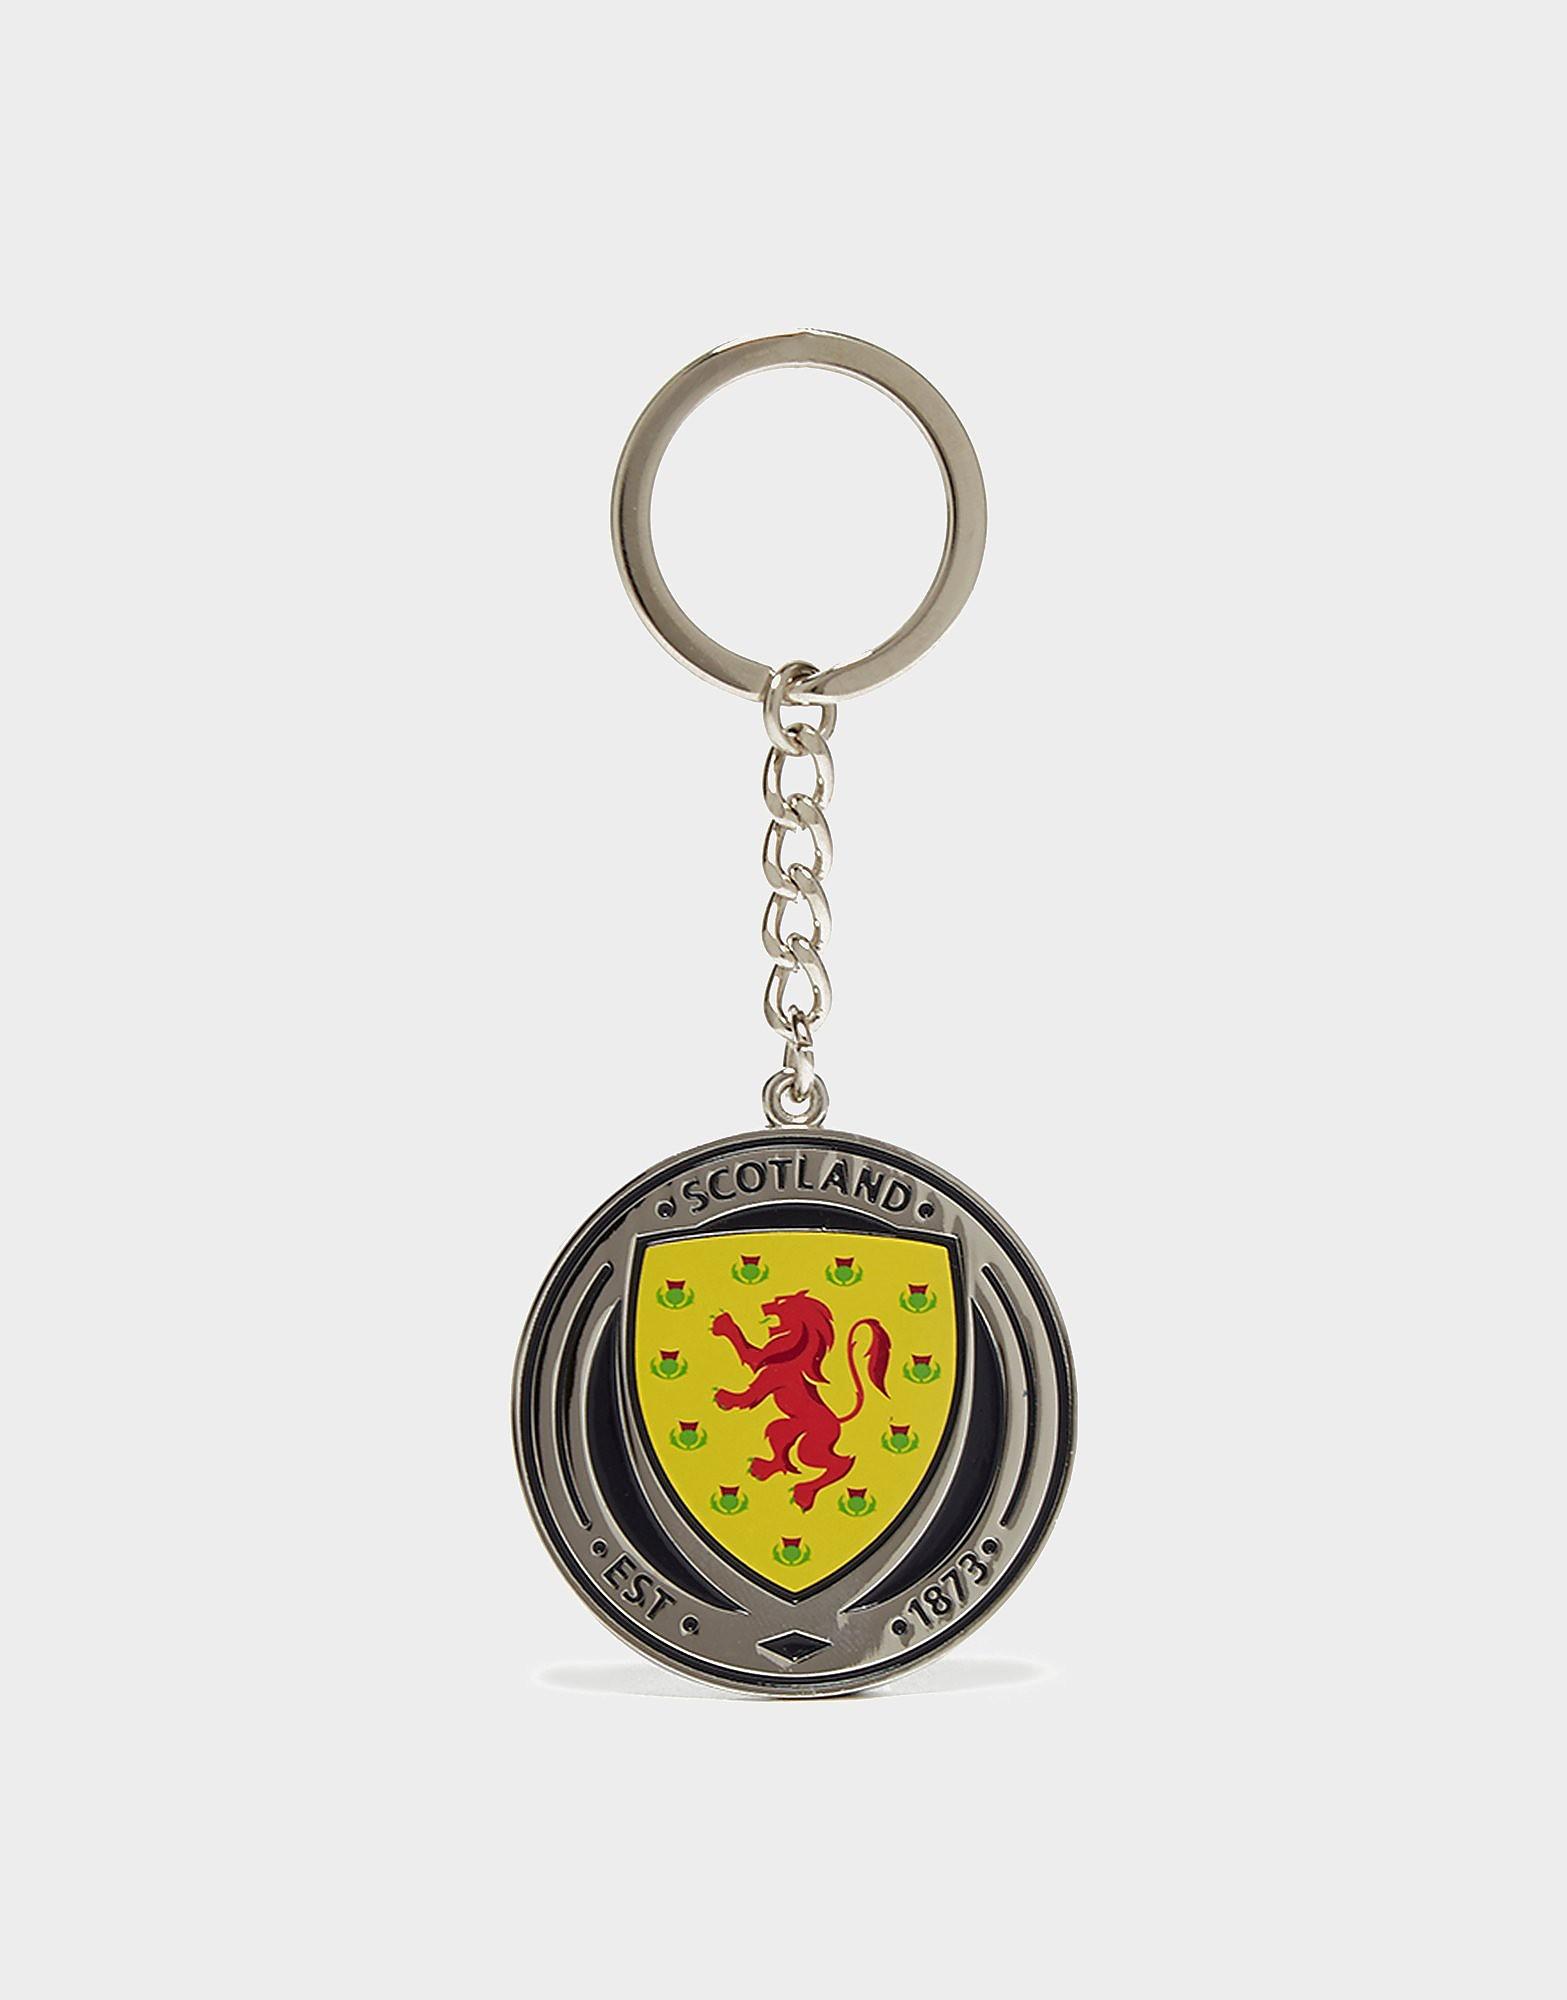 Official Team Schlüsselanhänger mit Schottland-Wappen